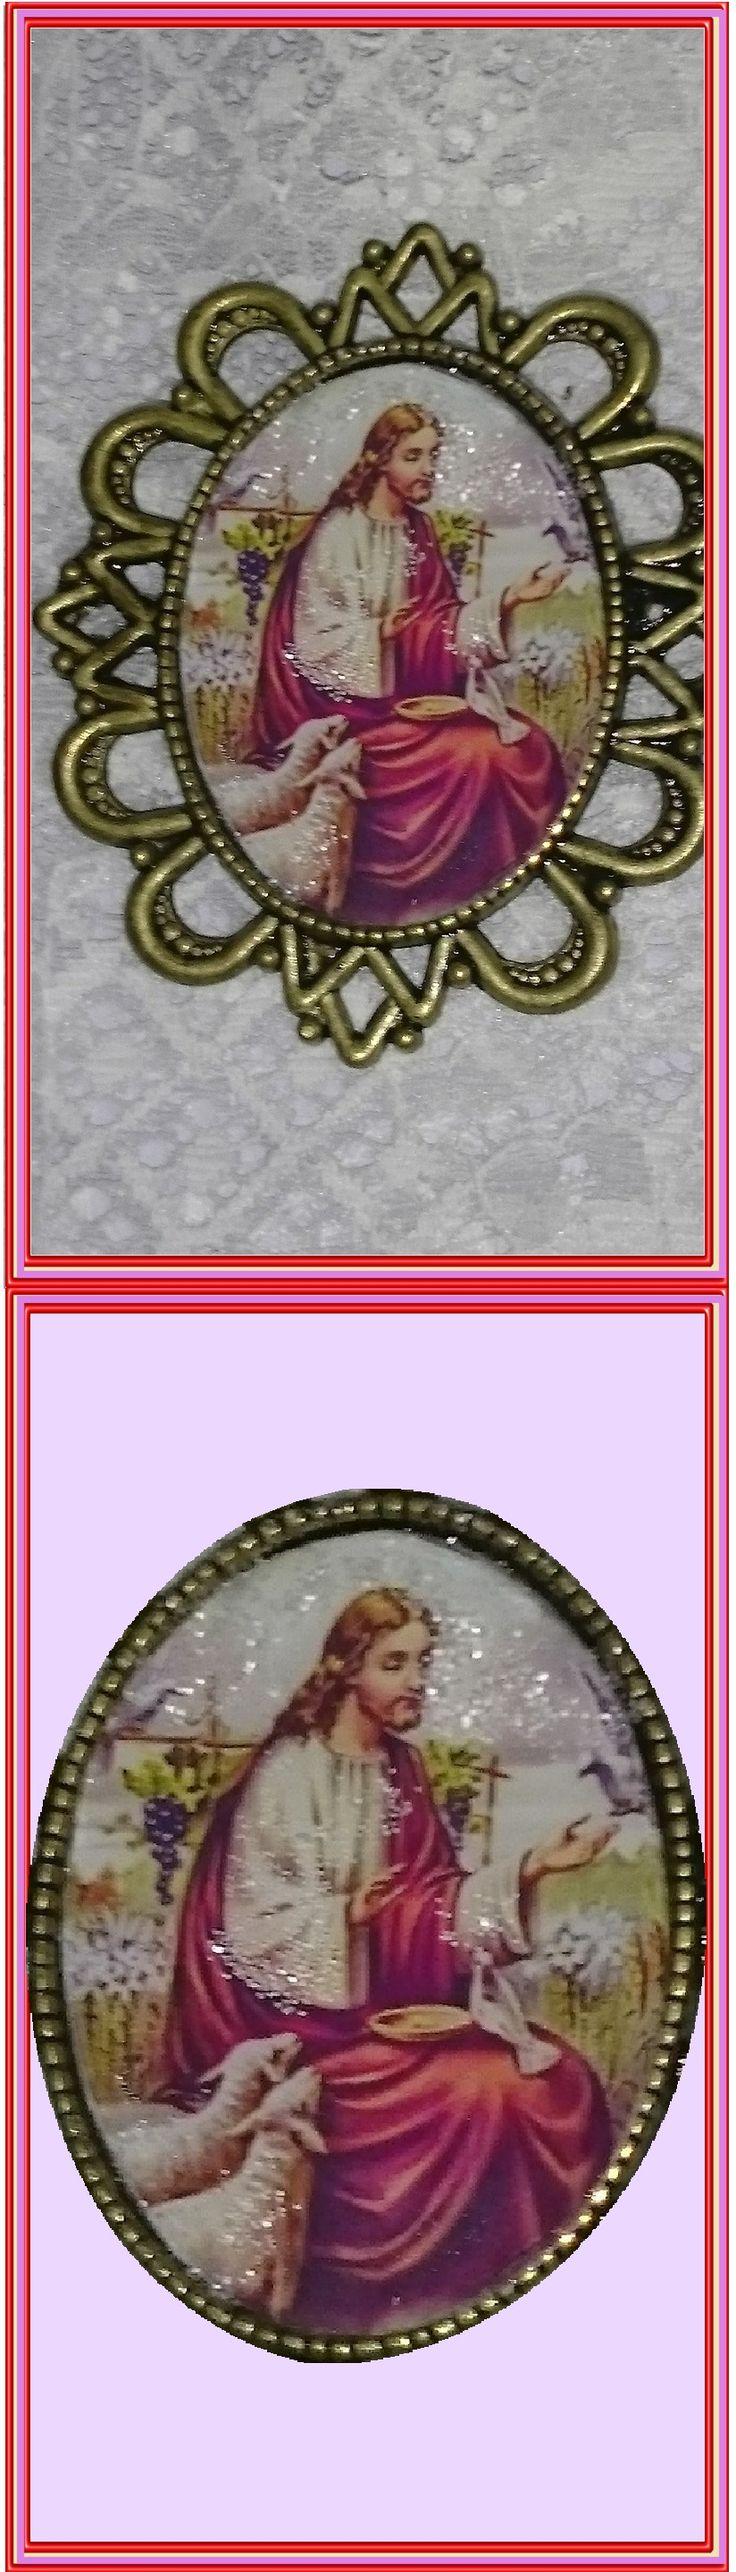 ❄ 22 € ✏✏✏✏✏✏✏✏✏✏✏✏✏ B318 VENTE EN LIGNE sur ALittleMarket http://www.alittlemarket.com/boutique/gaby_feerie-132444.html ✏✏✏✏✏✏✏✏✏✏✏✏✏✏✏✏ SALE ONLINE on Etsy FrenchJewelryVintage  https://www.etsy.com/shop/frenchjewelryvintage?ref=l2-shopheader-name ✏✏✏✏✏✏✏✏✏✏✏✏✏✏✏✏  IDEE CADEAU   ☞ http://gabyfeeriefr.tumblr.com/archive